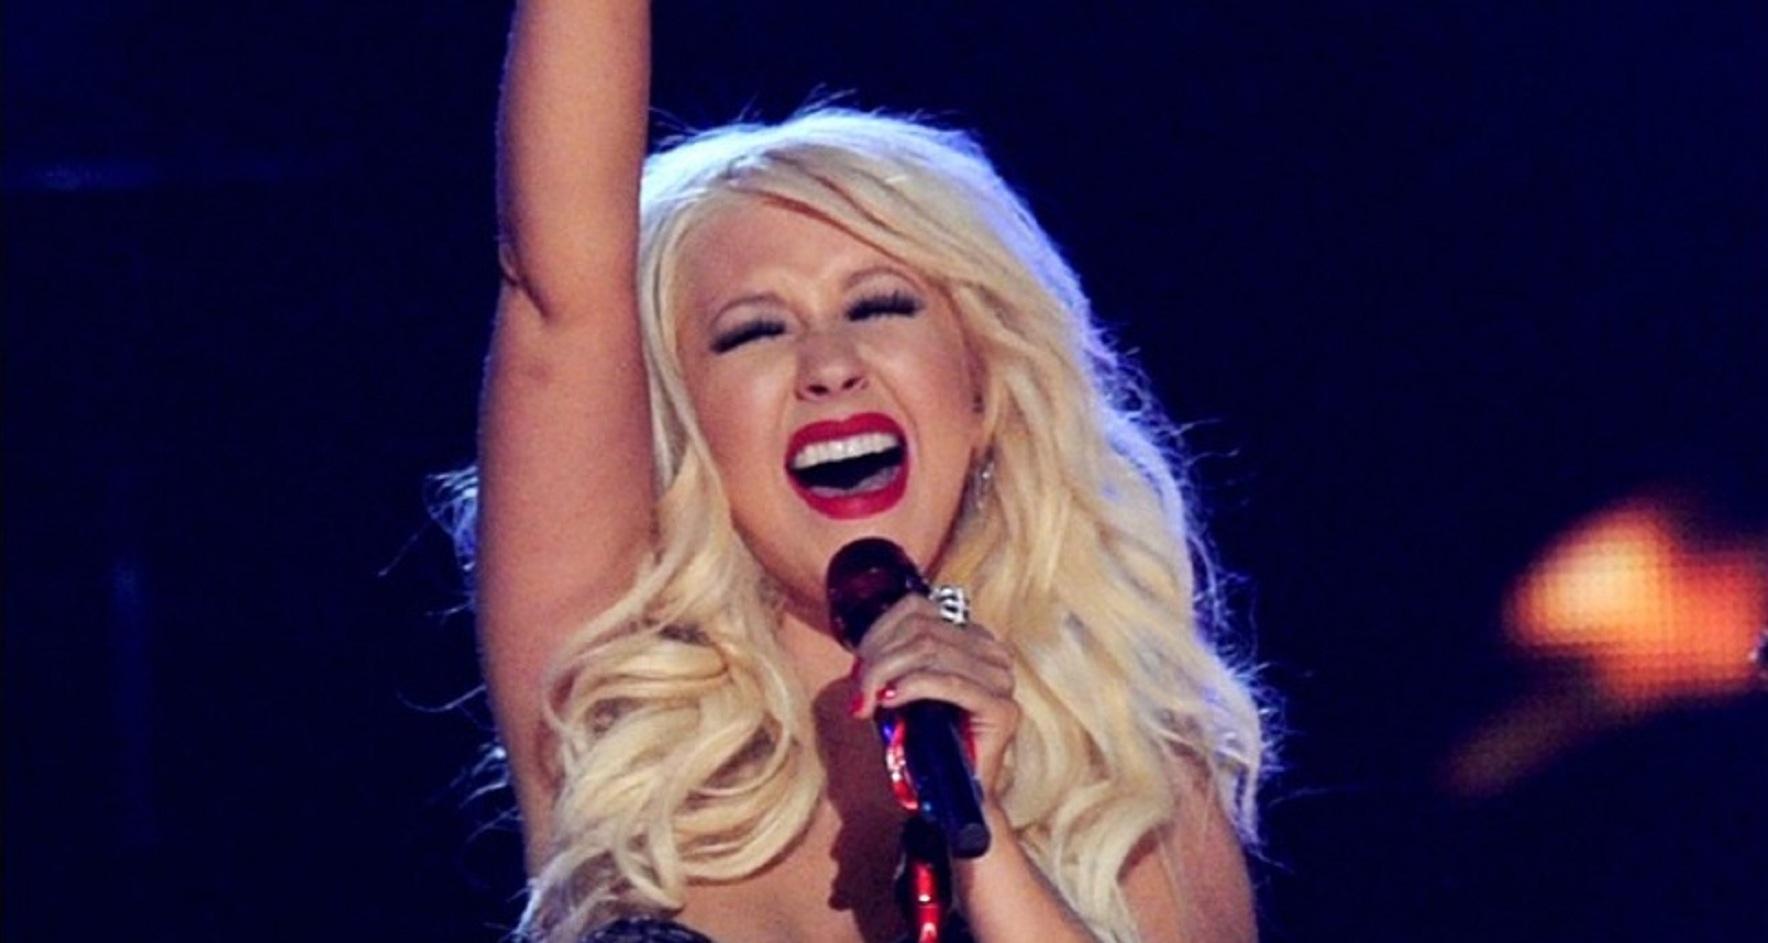 Watch: Christina Aguilera Kicks-Off 'Liberation Tour' with SLAYING Vocals!